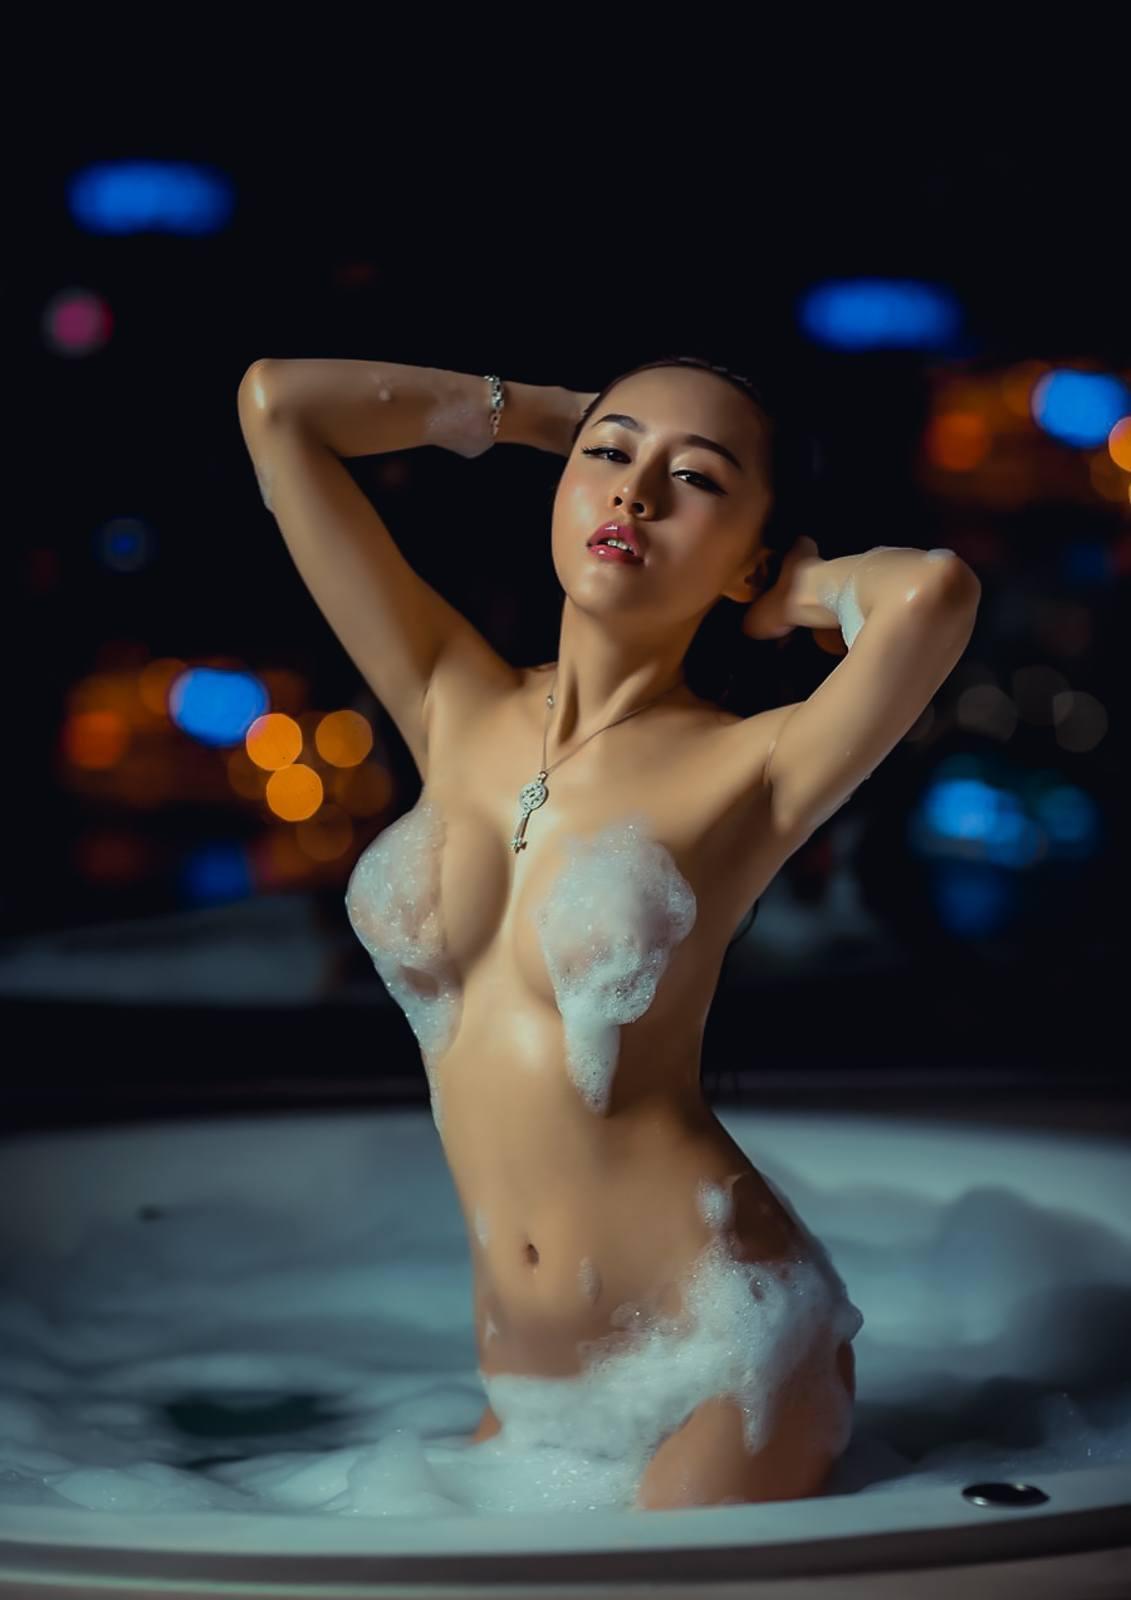 20141219212118291 42284151 - Korean Nude - Big Albom Remain #A-korean girl